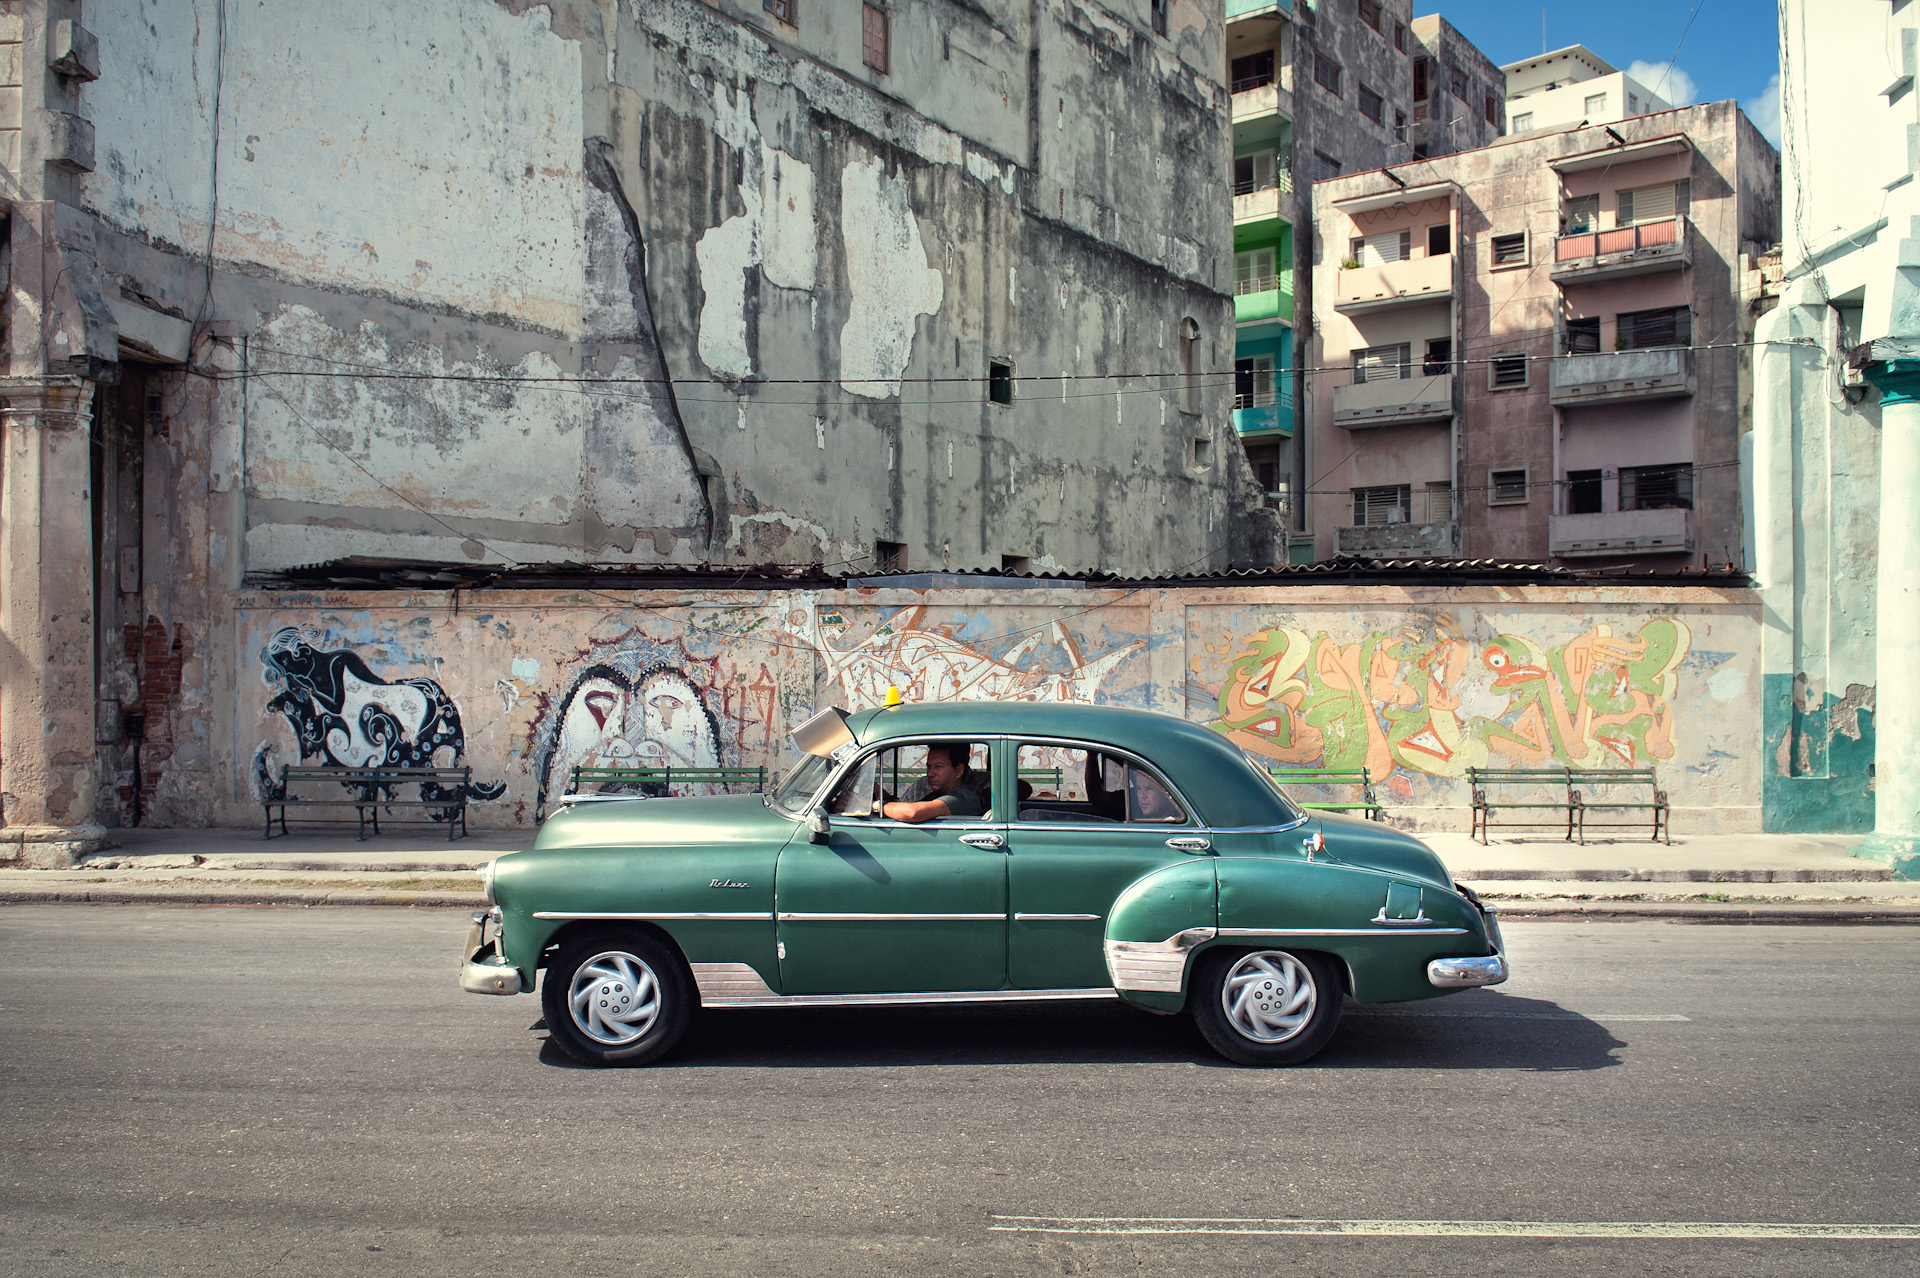 Cuba-Havana-Travel-Old-Car-Street_2.JPG